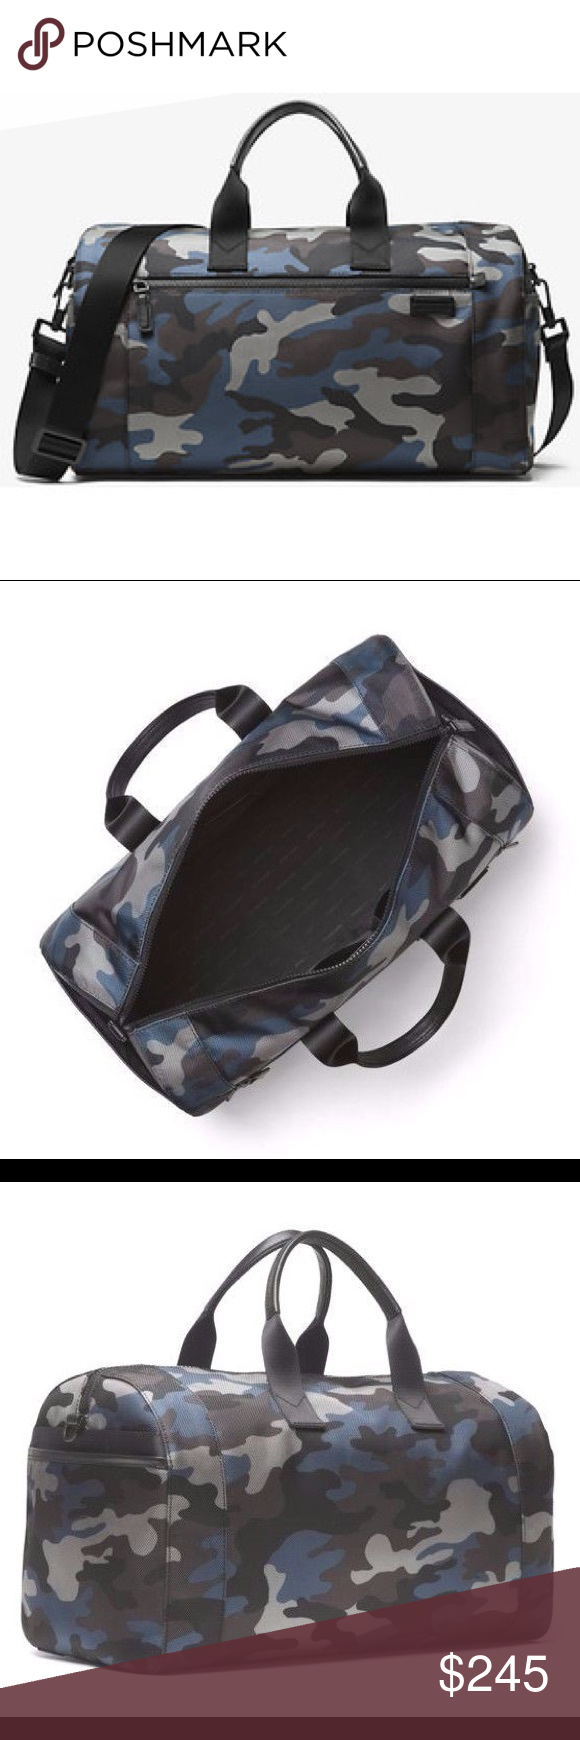 747db29da78f Brand new Men s Large Duffle bag NWT Michael Kors Travis Camouflage Nylon  Duffel Travel Gym Bag